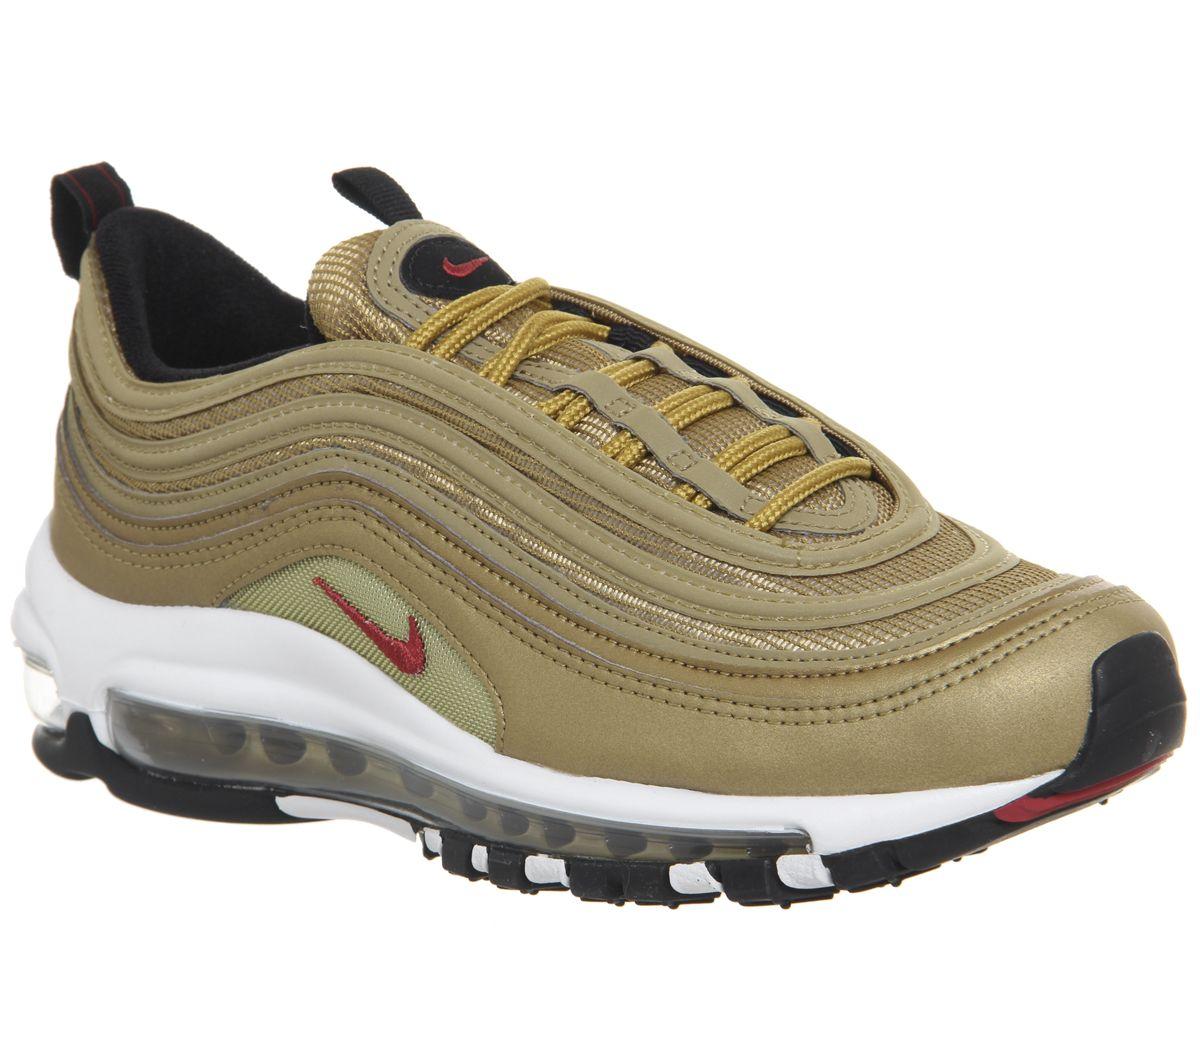 c4139d1497b800 Nike Air Max 97 Gs Trainers Gold - Sneaker damen